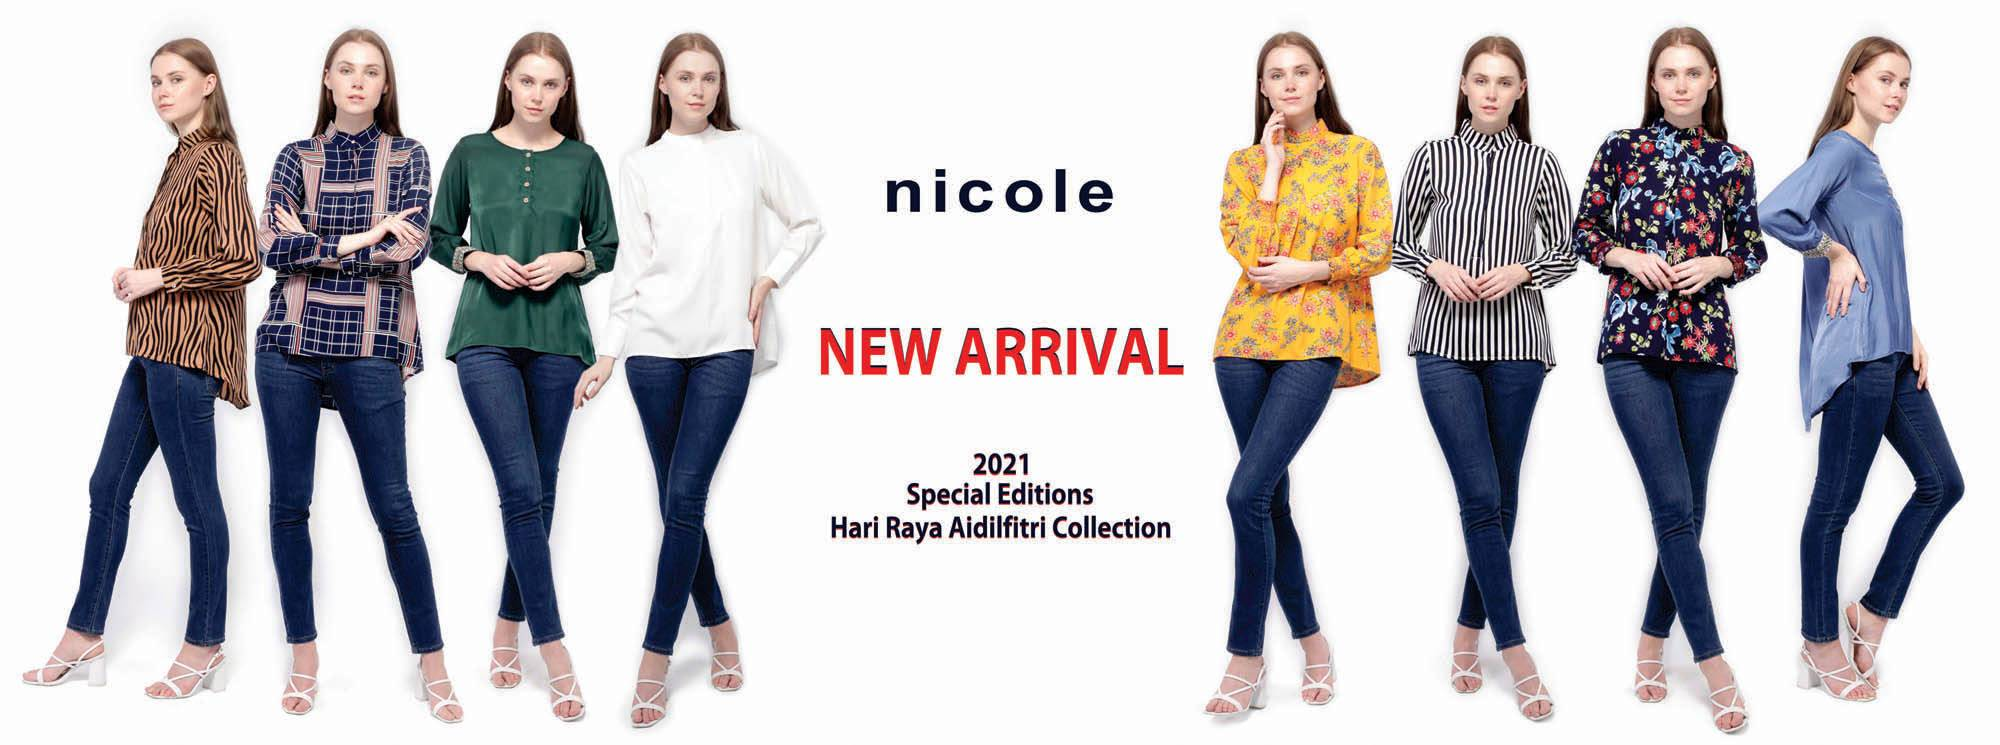 NICOLE NEW ARRIVAL